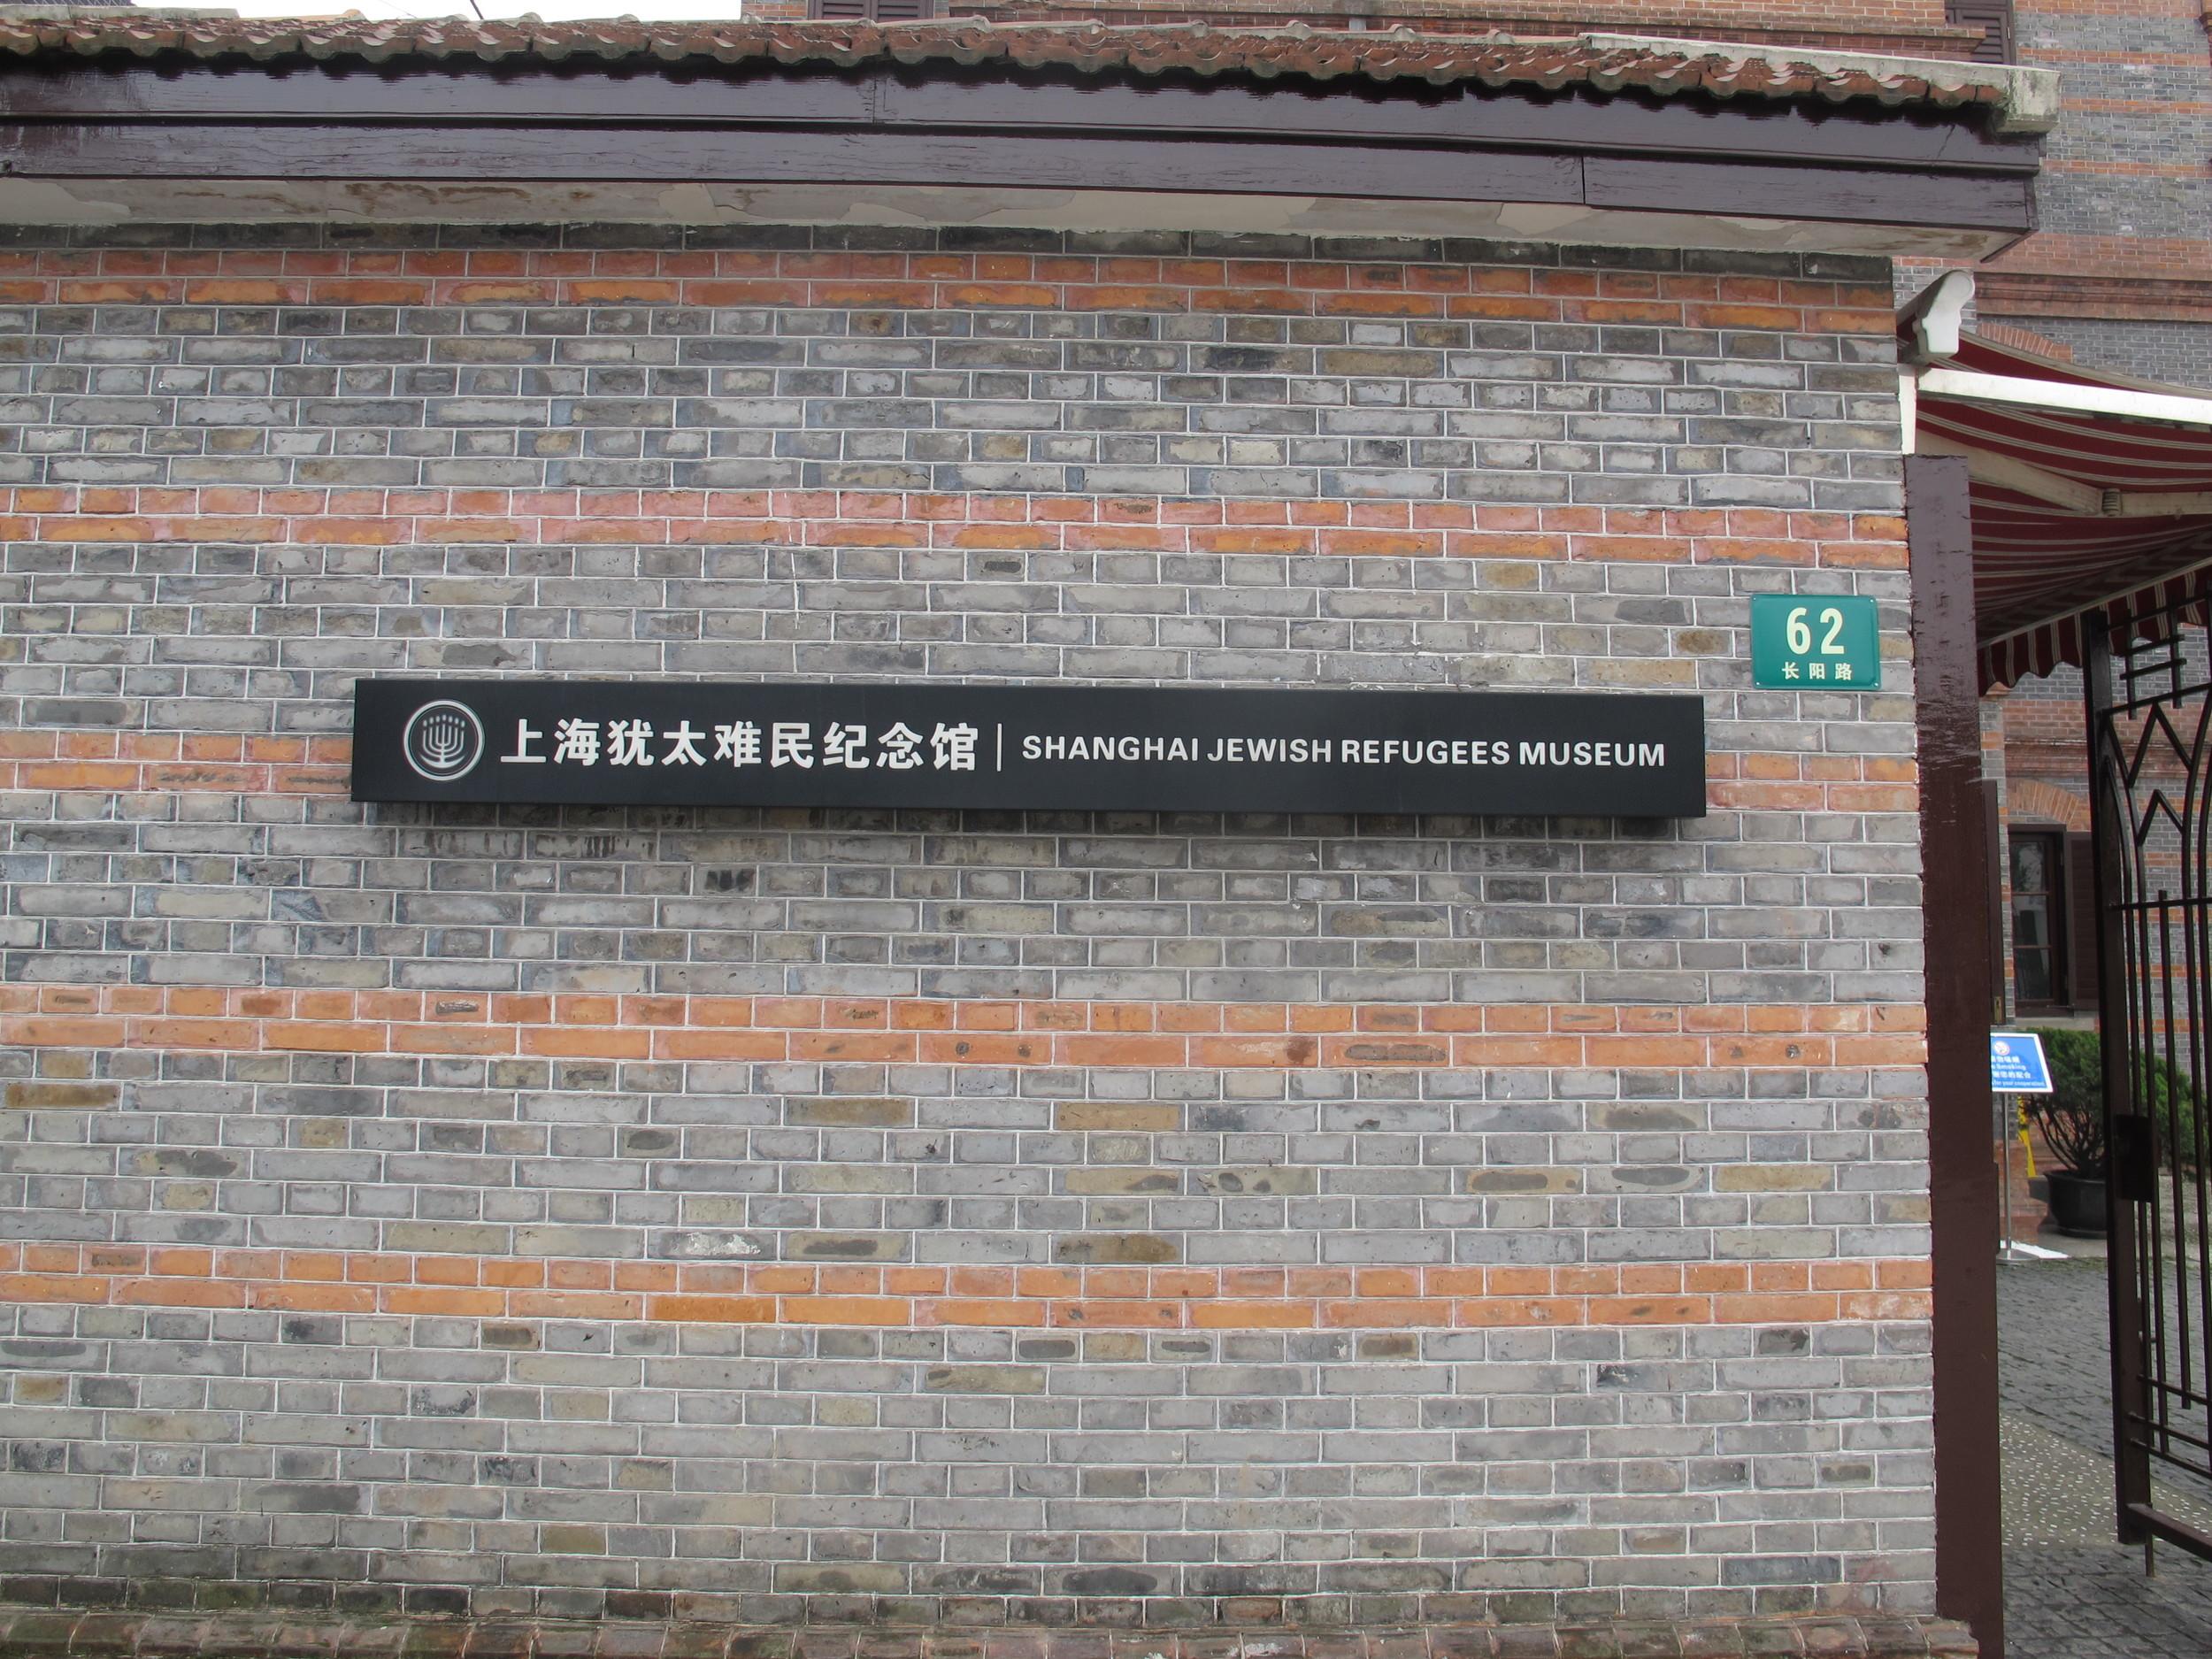 Entrance to Shanghai Jewish Refugees Museum